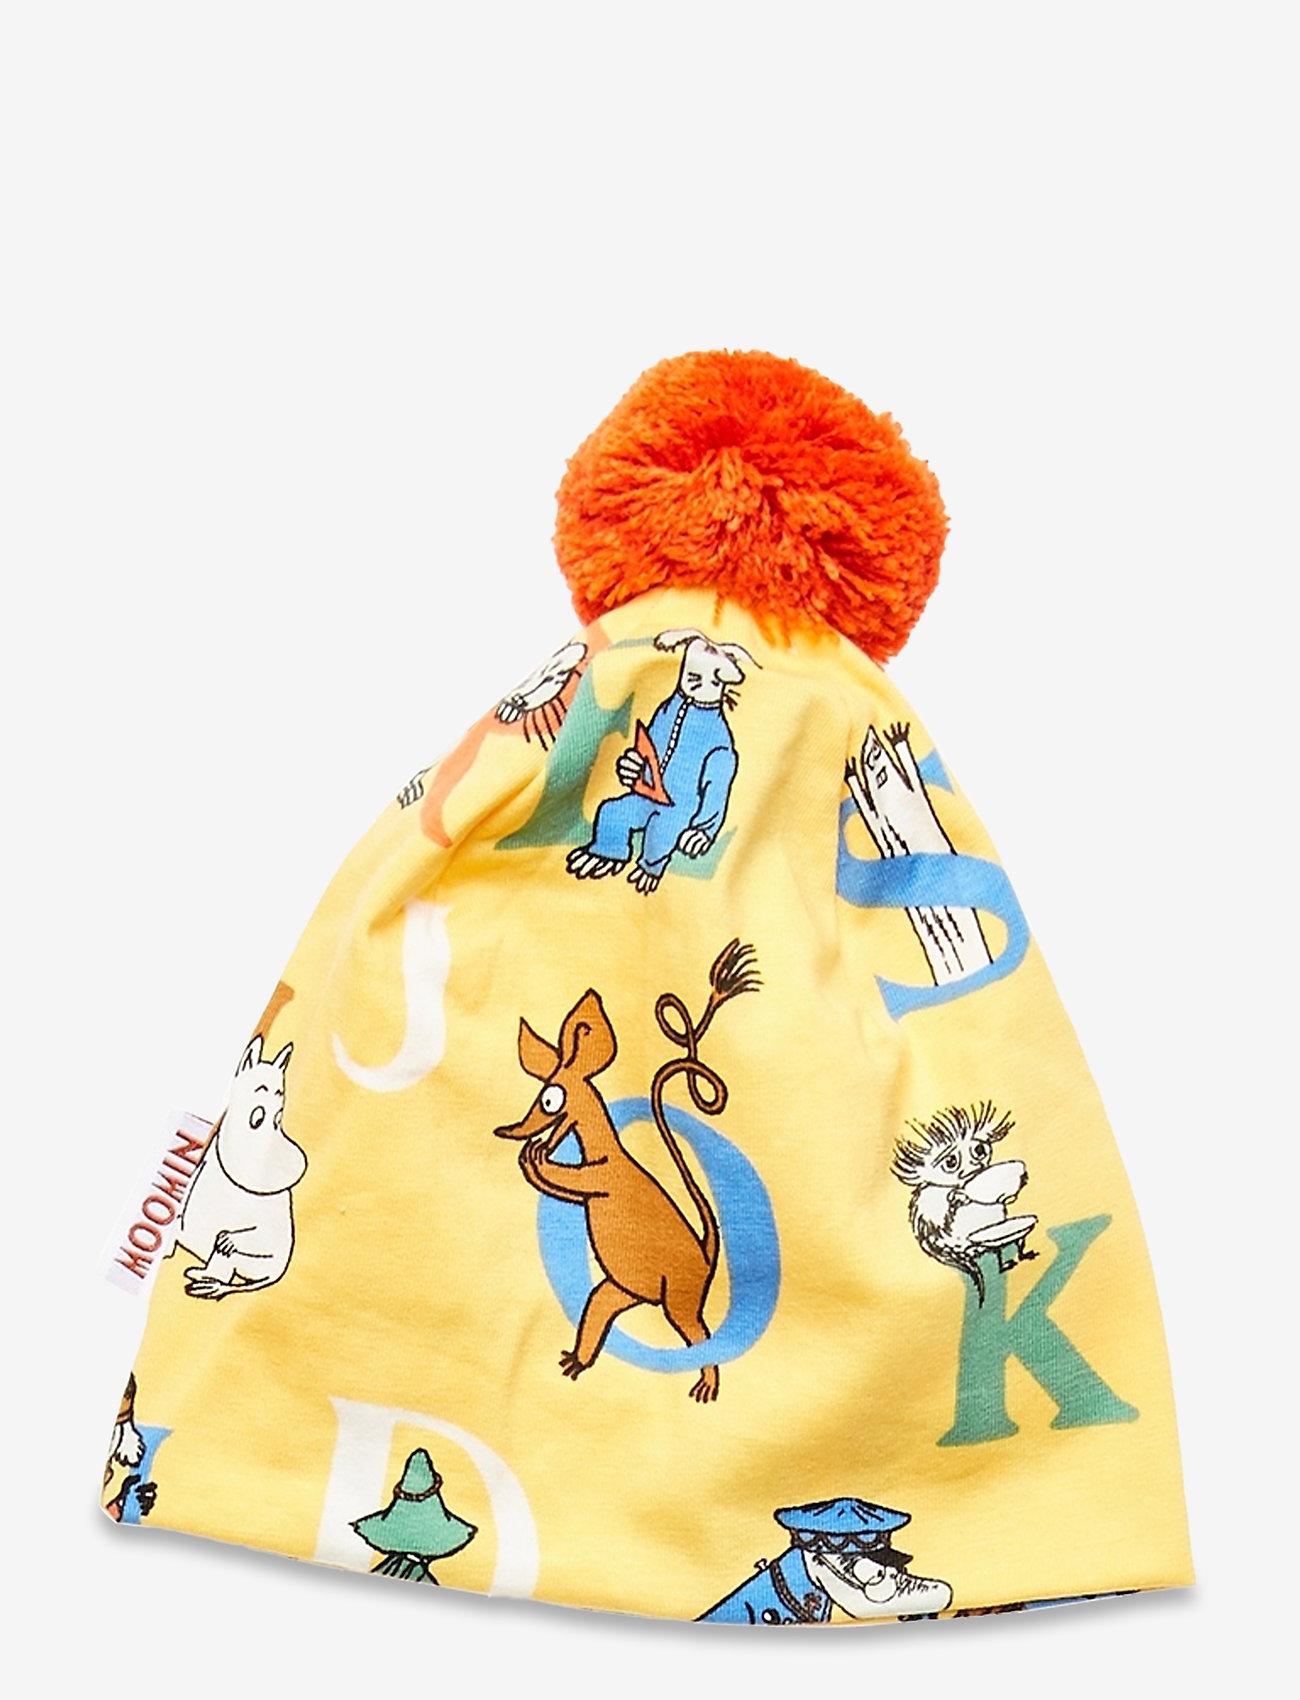 Martinex - ALPHABET BEANIE - hatte og handsker - yellow - 0